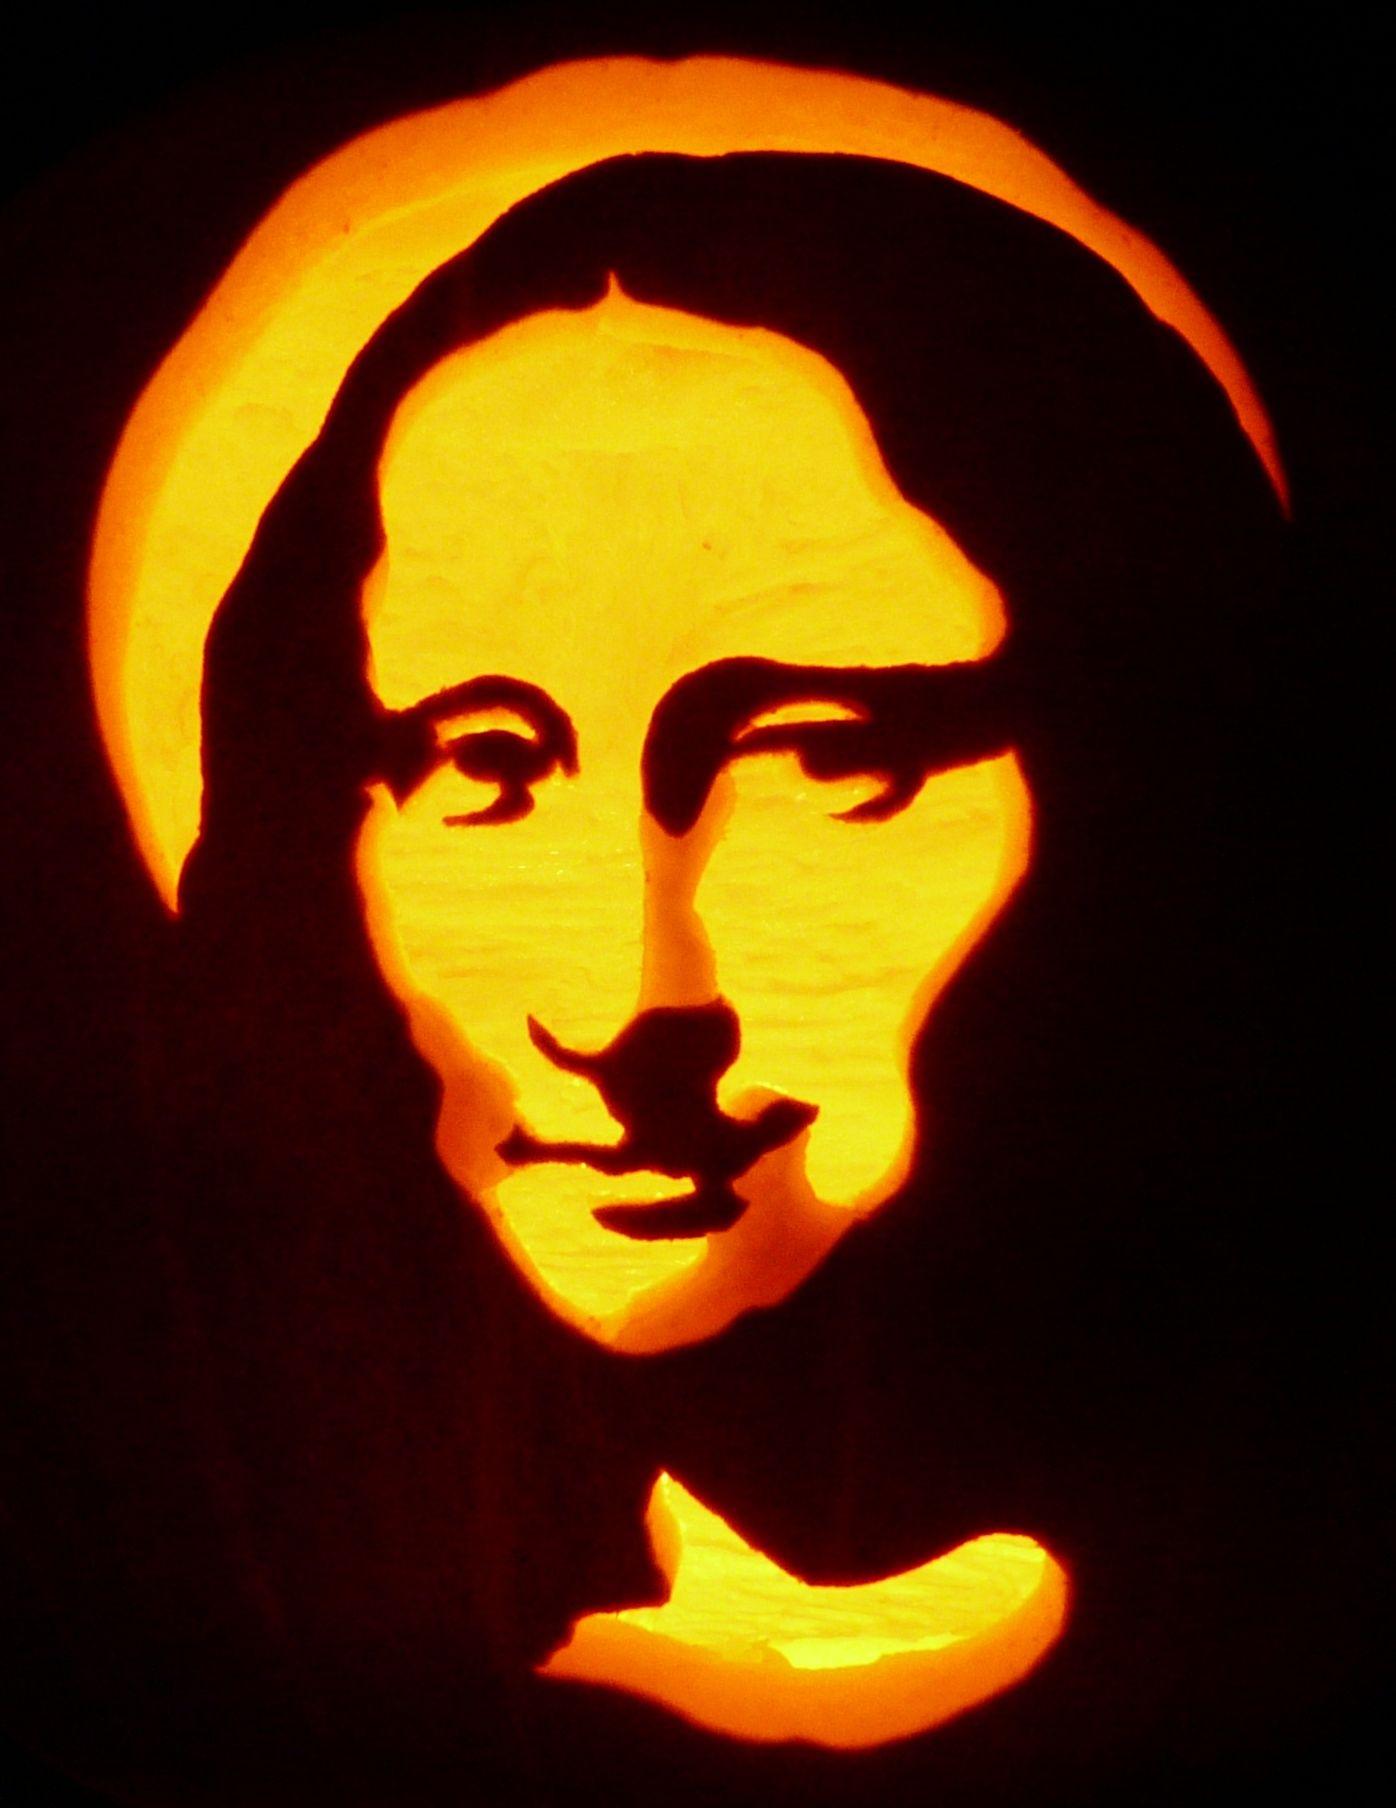 carved pumpkin mona lisa pattern by pumpkinglow com pumpkin